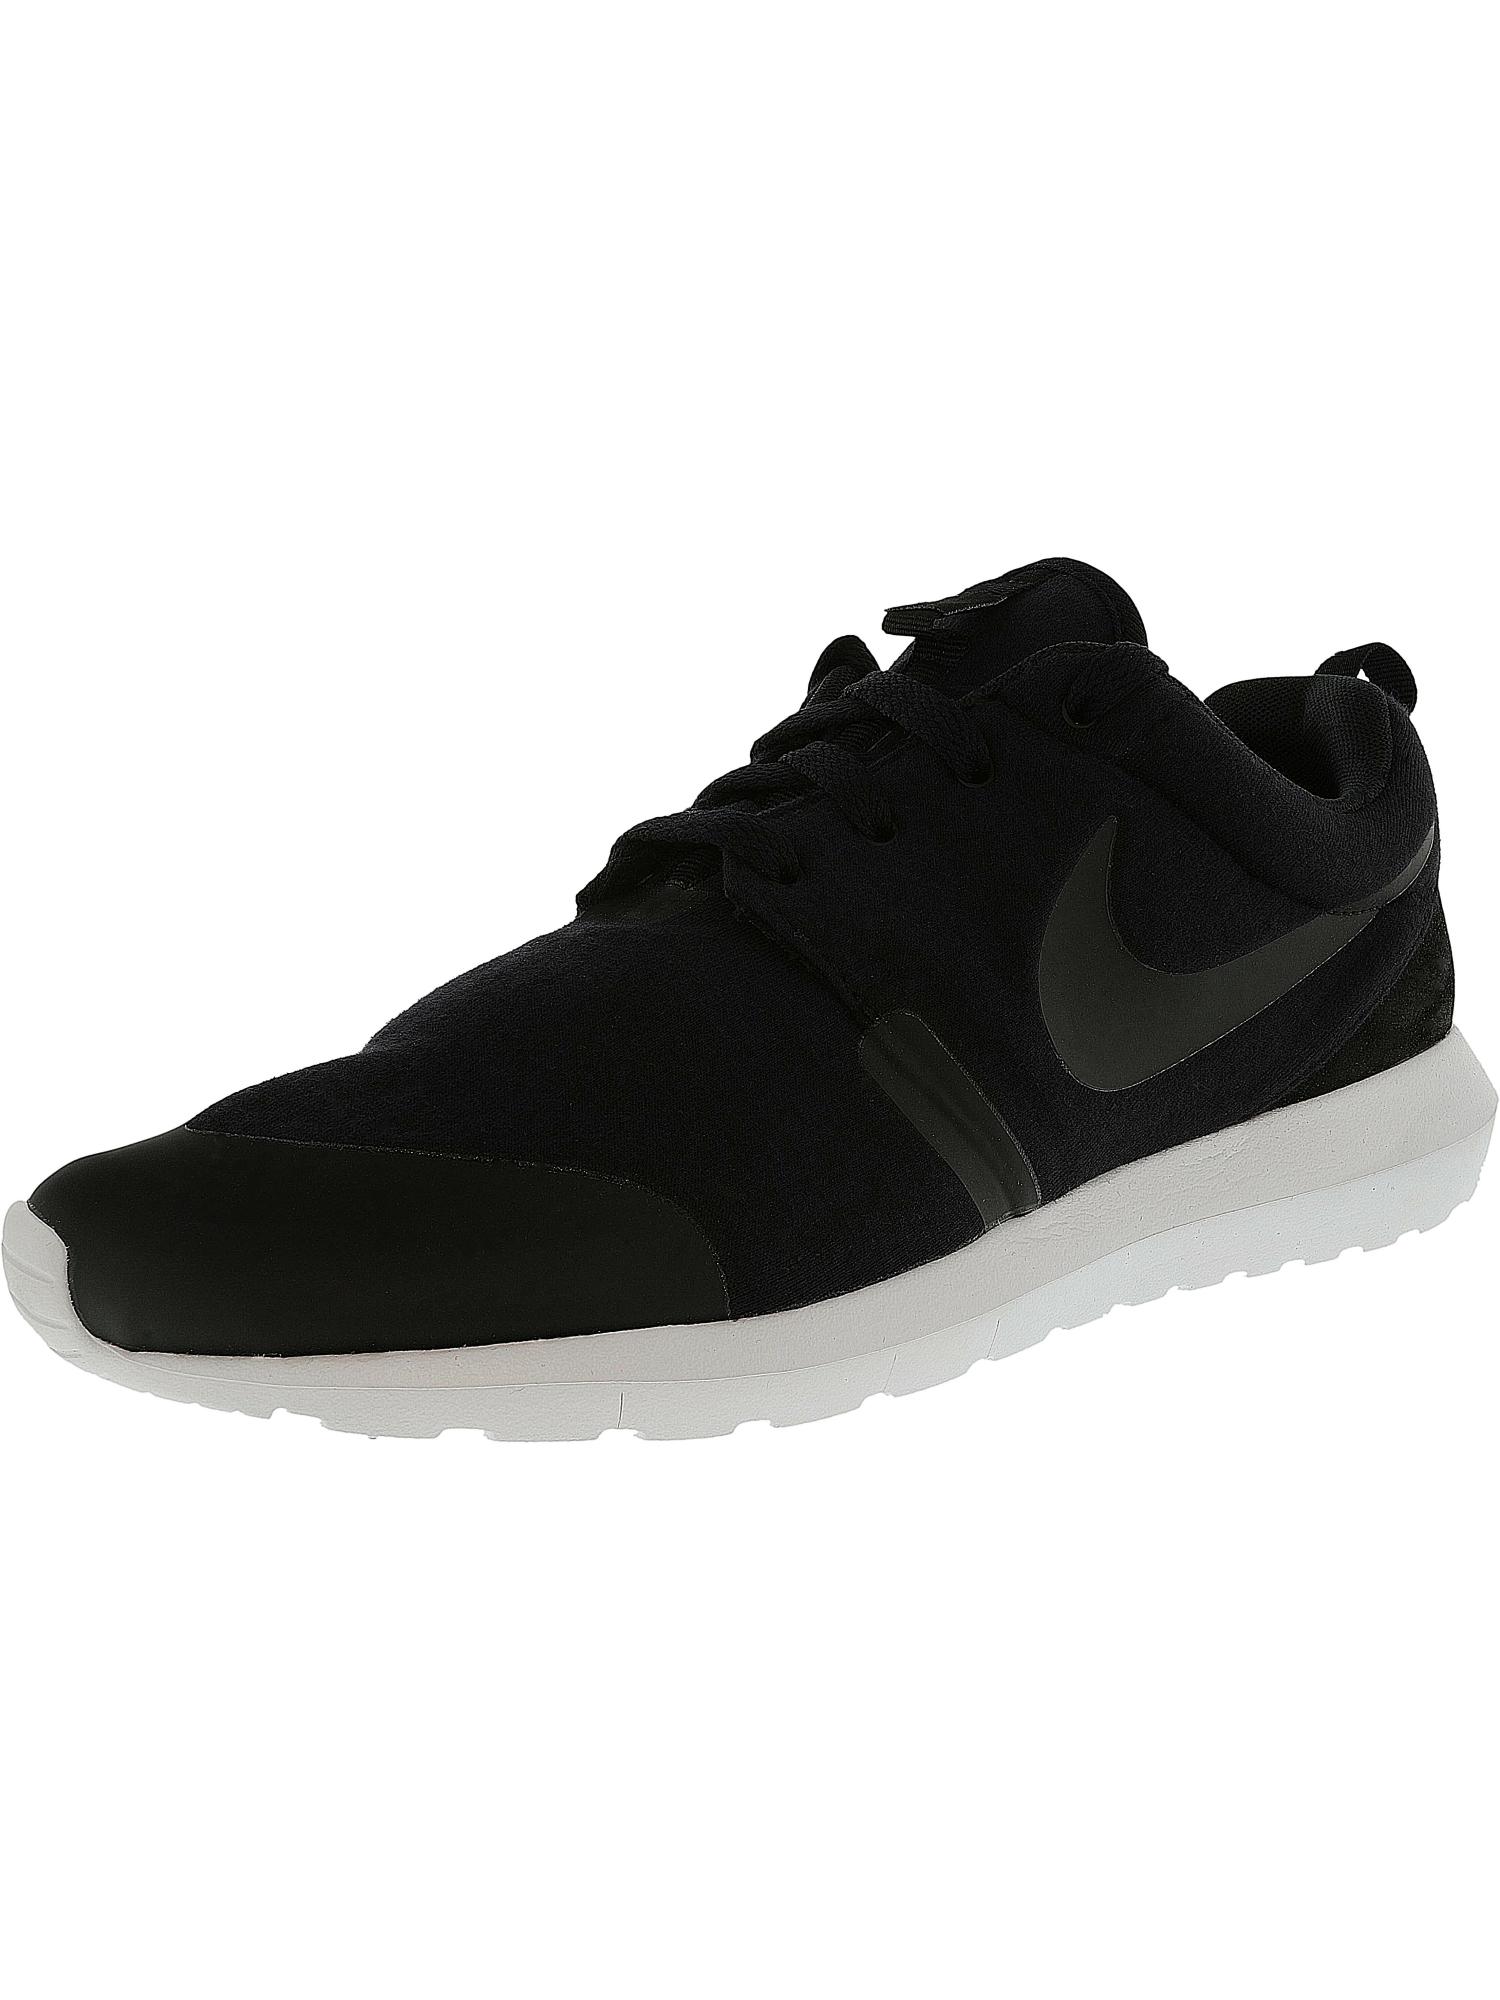 new product 9c92b 4425e ... Nike Nike Nike Men s Roshe Nm Tp Ankle-High Running Shoe e7ea50 ...